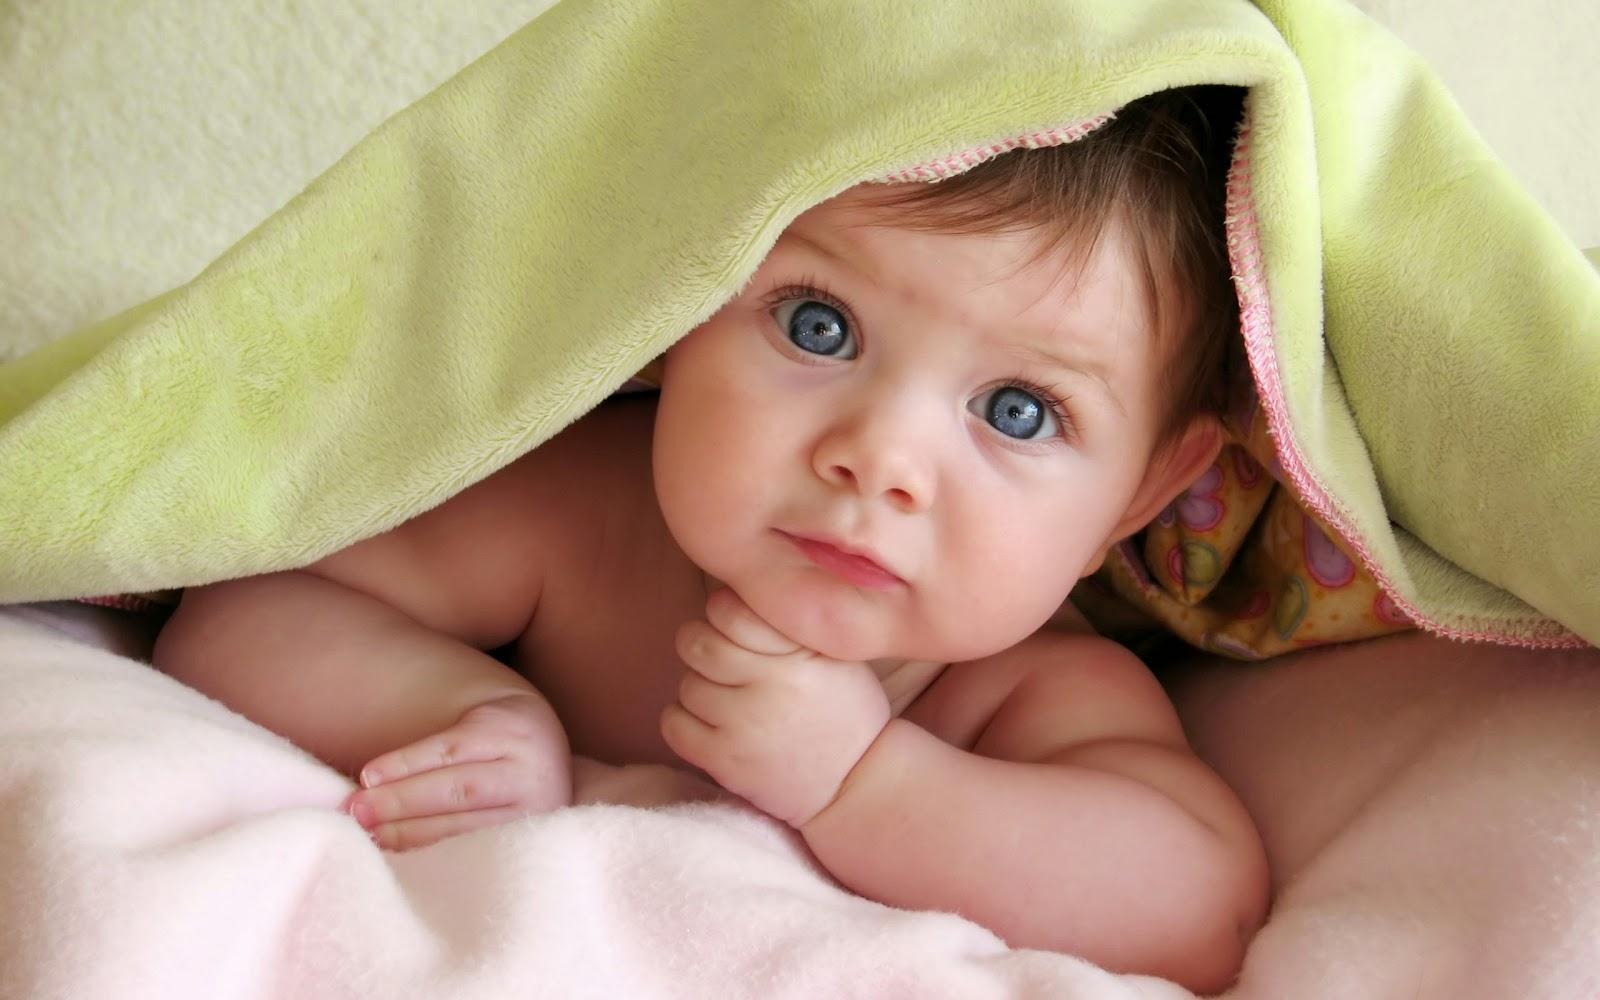 little kids hd pictures cute baby desktop wallpapers - Little Kids Pictures